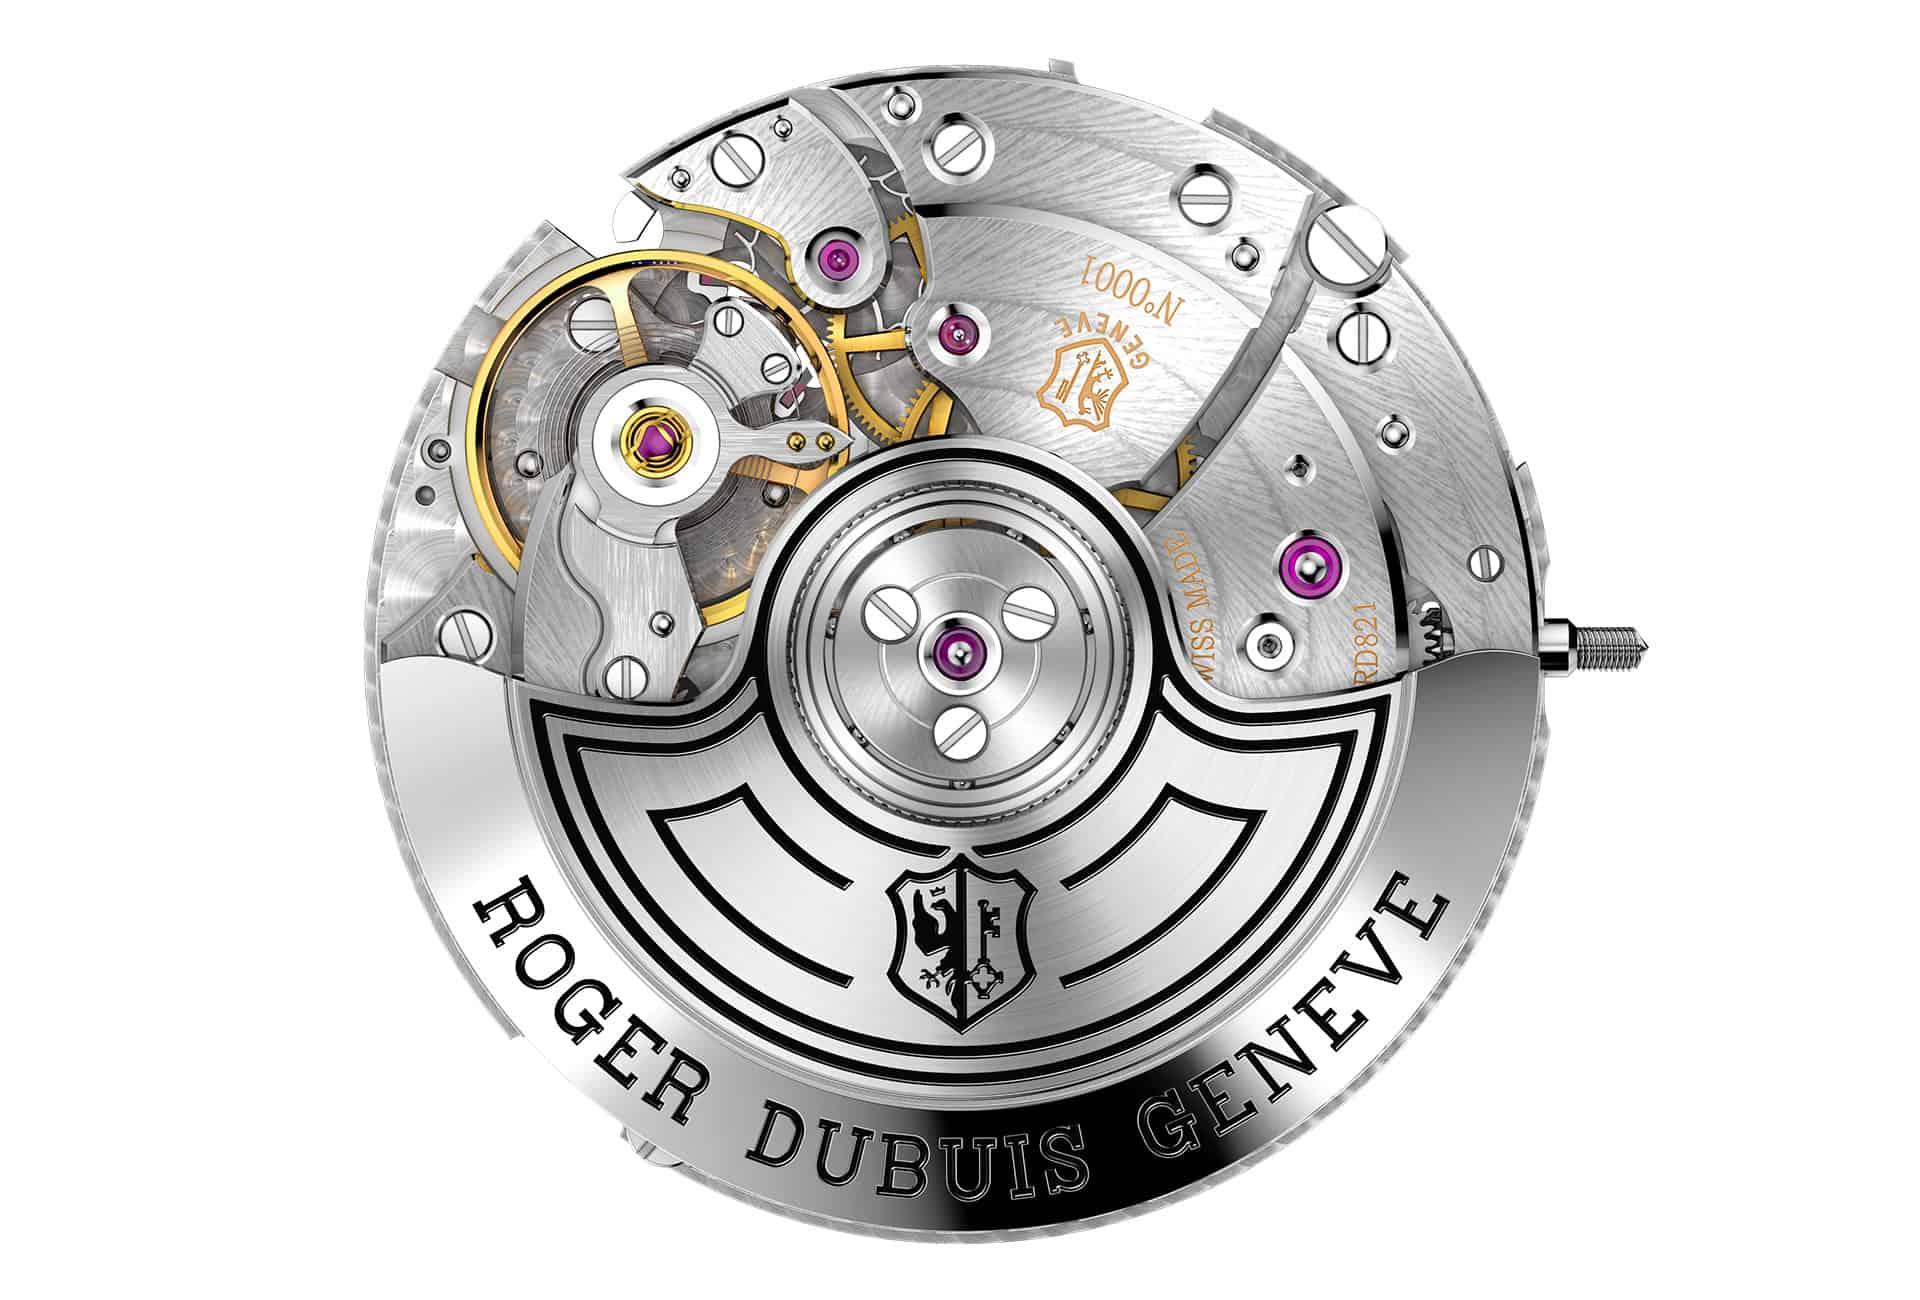 Roger Dubuis Calibre RD821